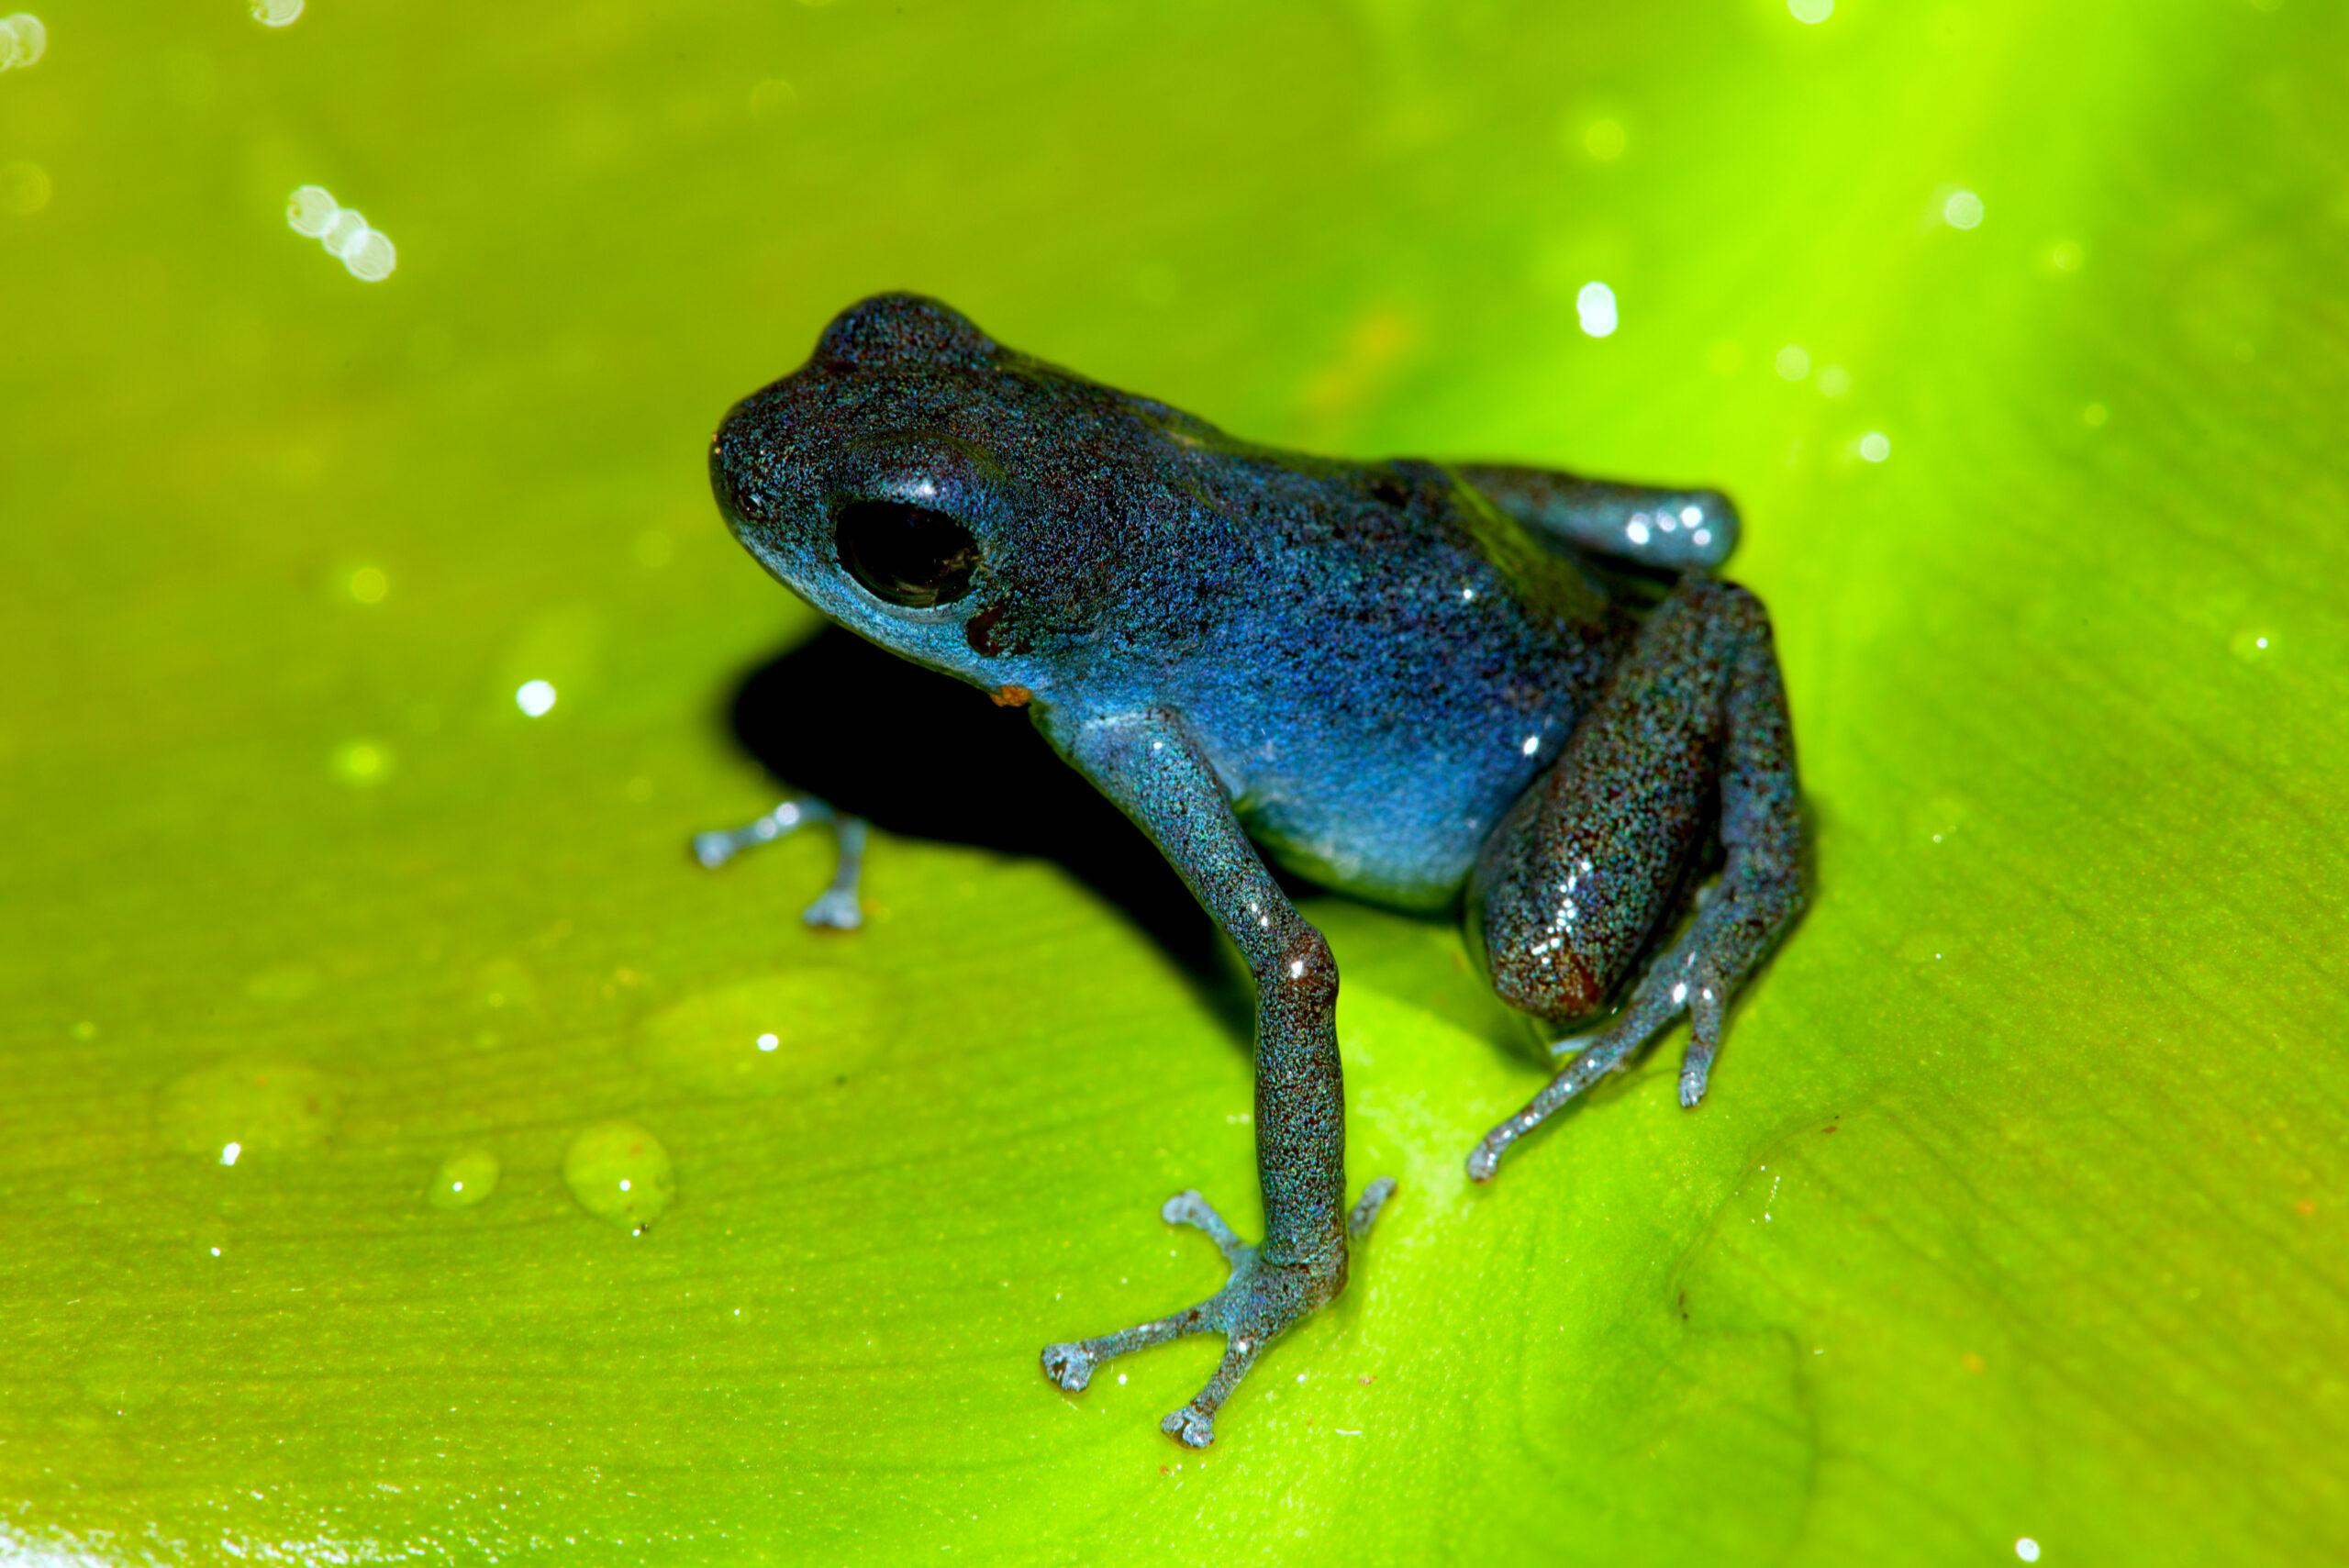 Oophaga pumilio from Tierra Oscar, Bocas del Toro, Panama in their habitat- by E. Van Heygen.